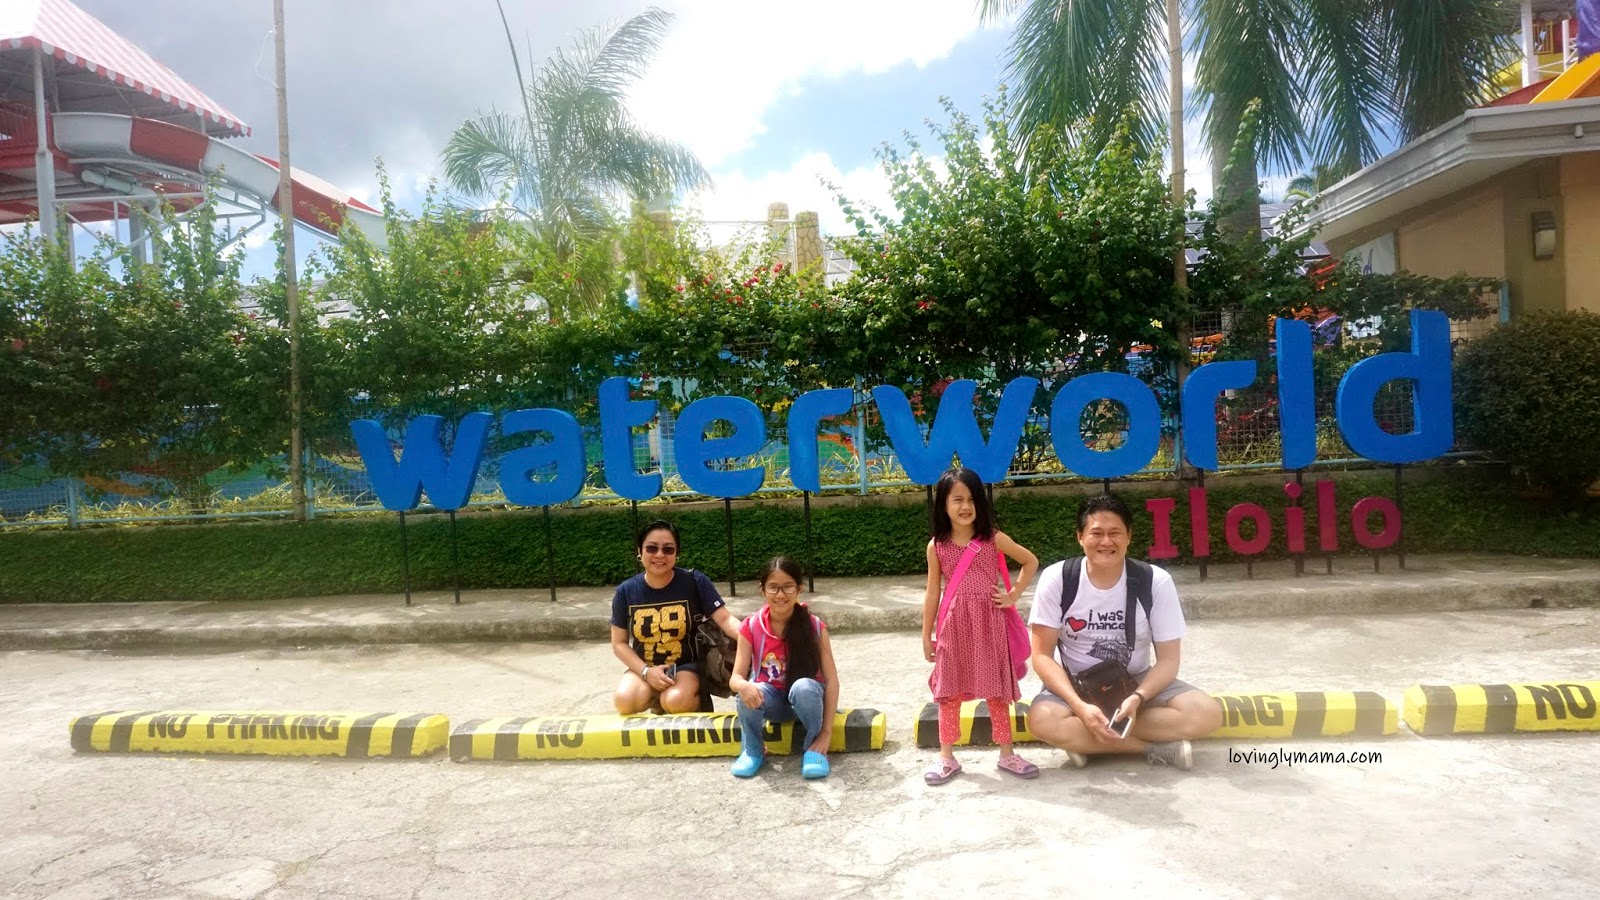 WaterWorld Iloilo 2nd Anniversary foam party - second anniversary - family travel - Iloilo City - Iloilo resort - Iloilo water park -Iloilo hotel- Bacolod blogger - Bacolod mommy blogger - Eon Centennial Resort Hotel